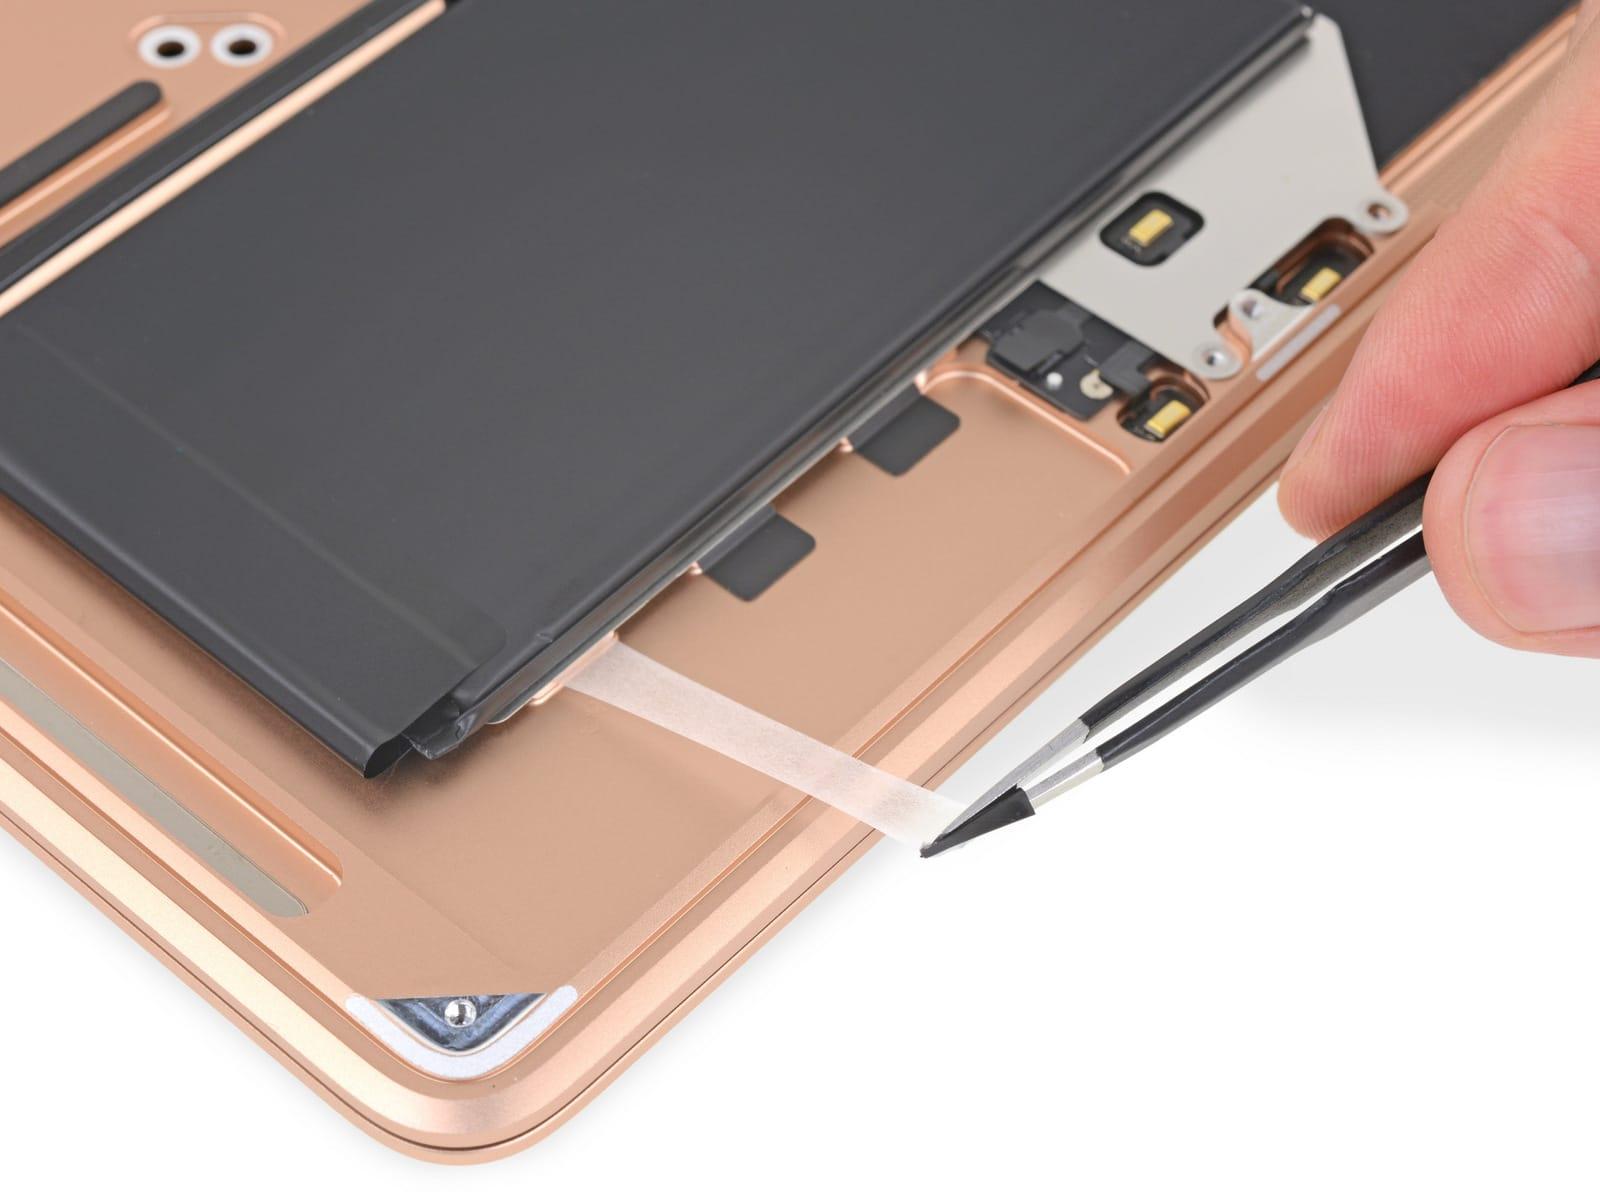 2018 MacBook Air battery glue